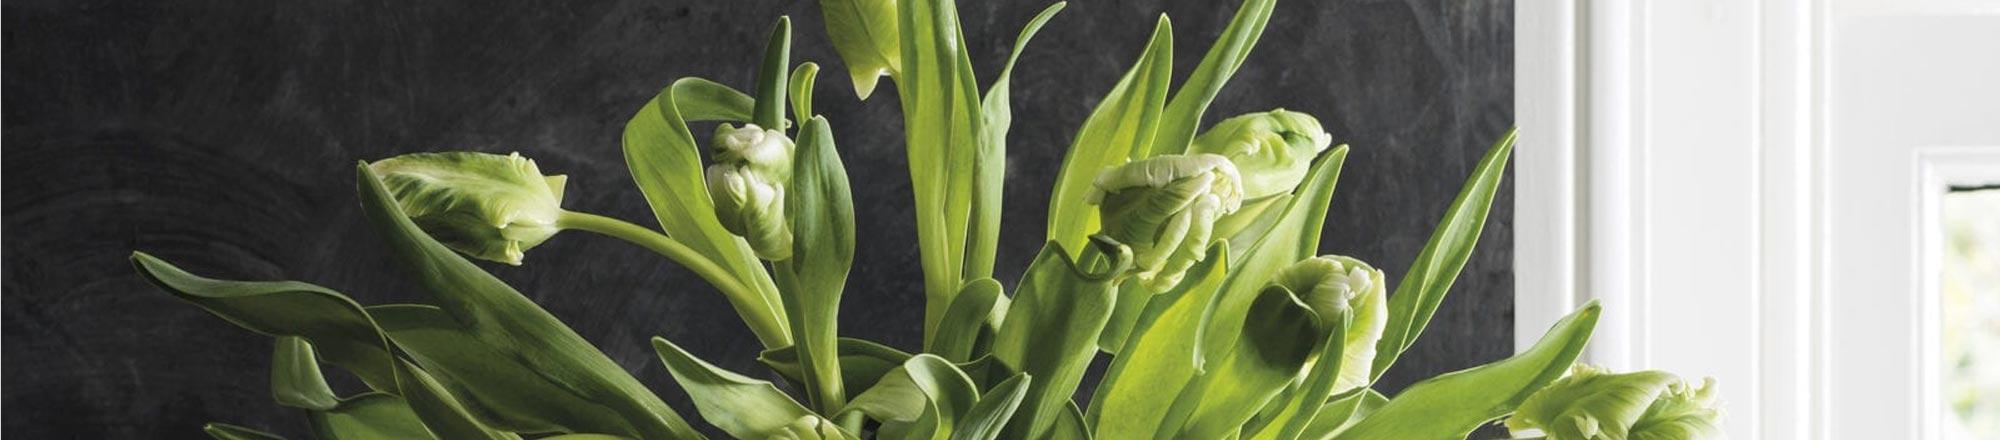 Alles over tulpen